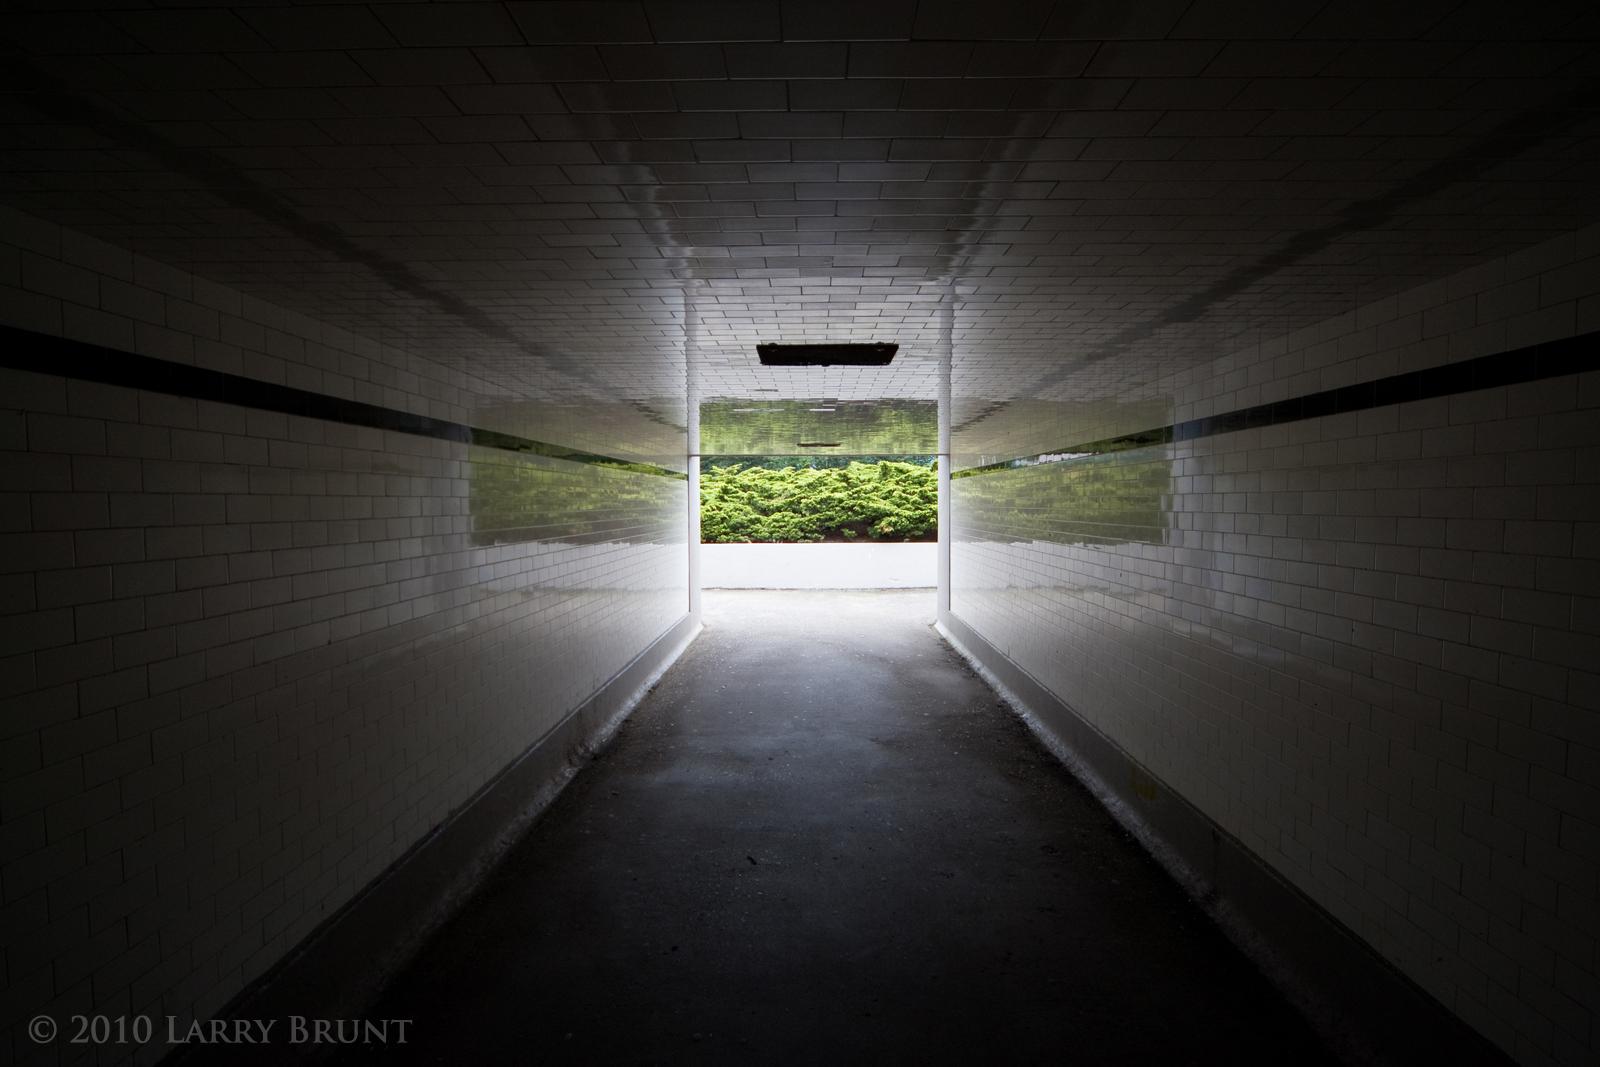 Tunnel by inessentialstuff